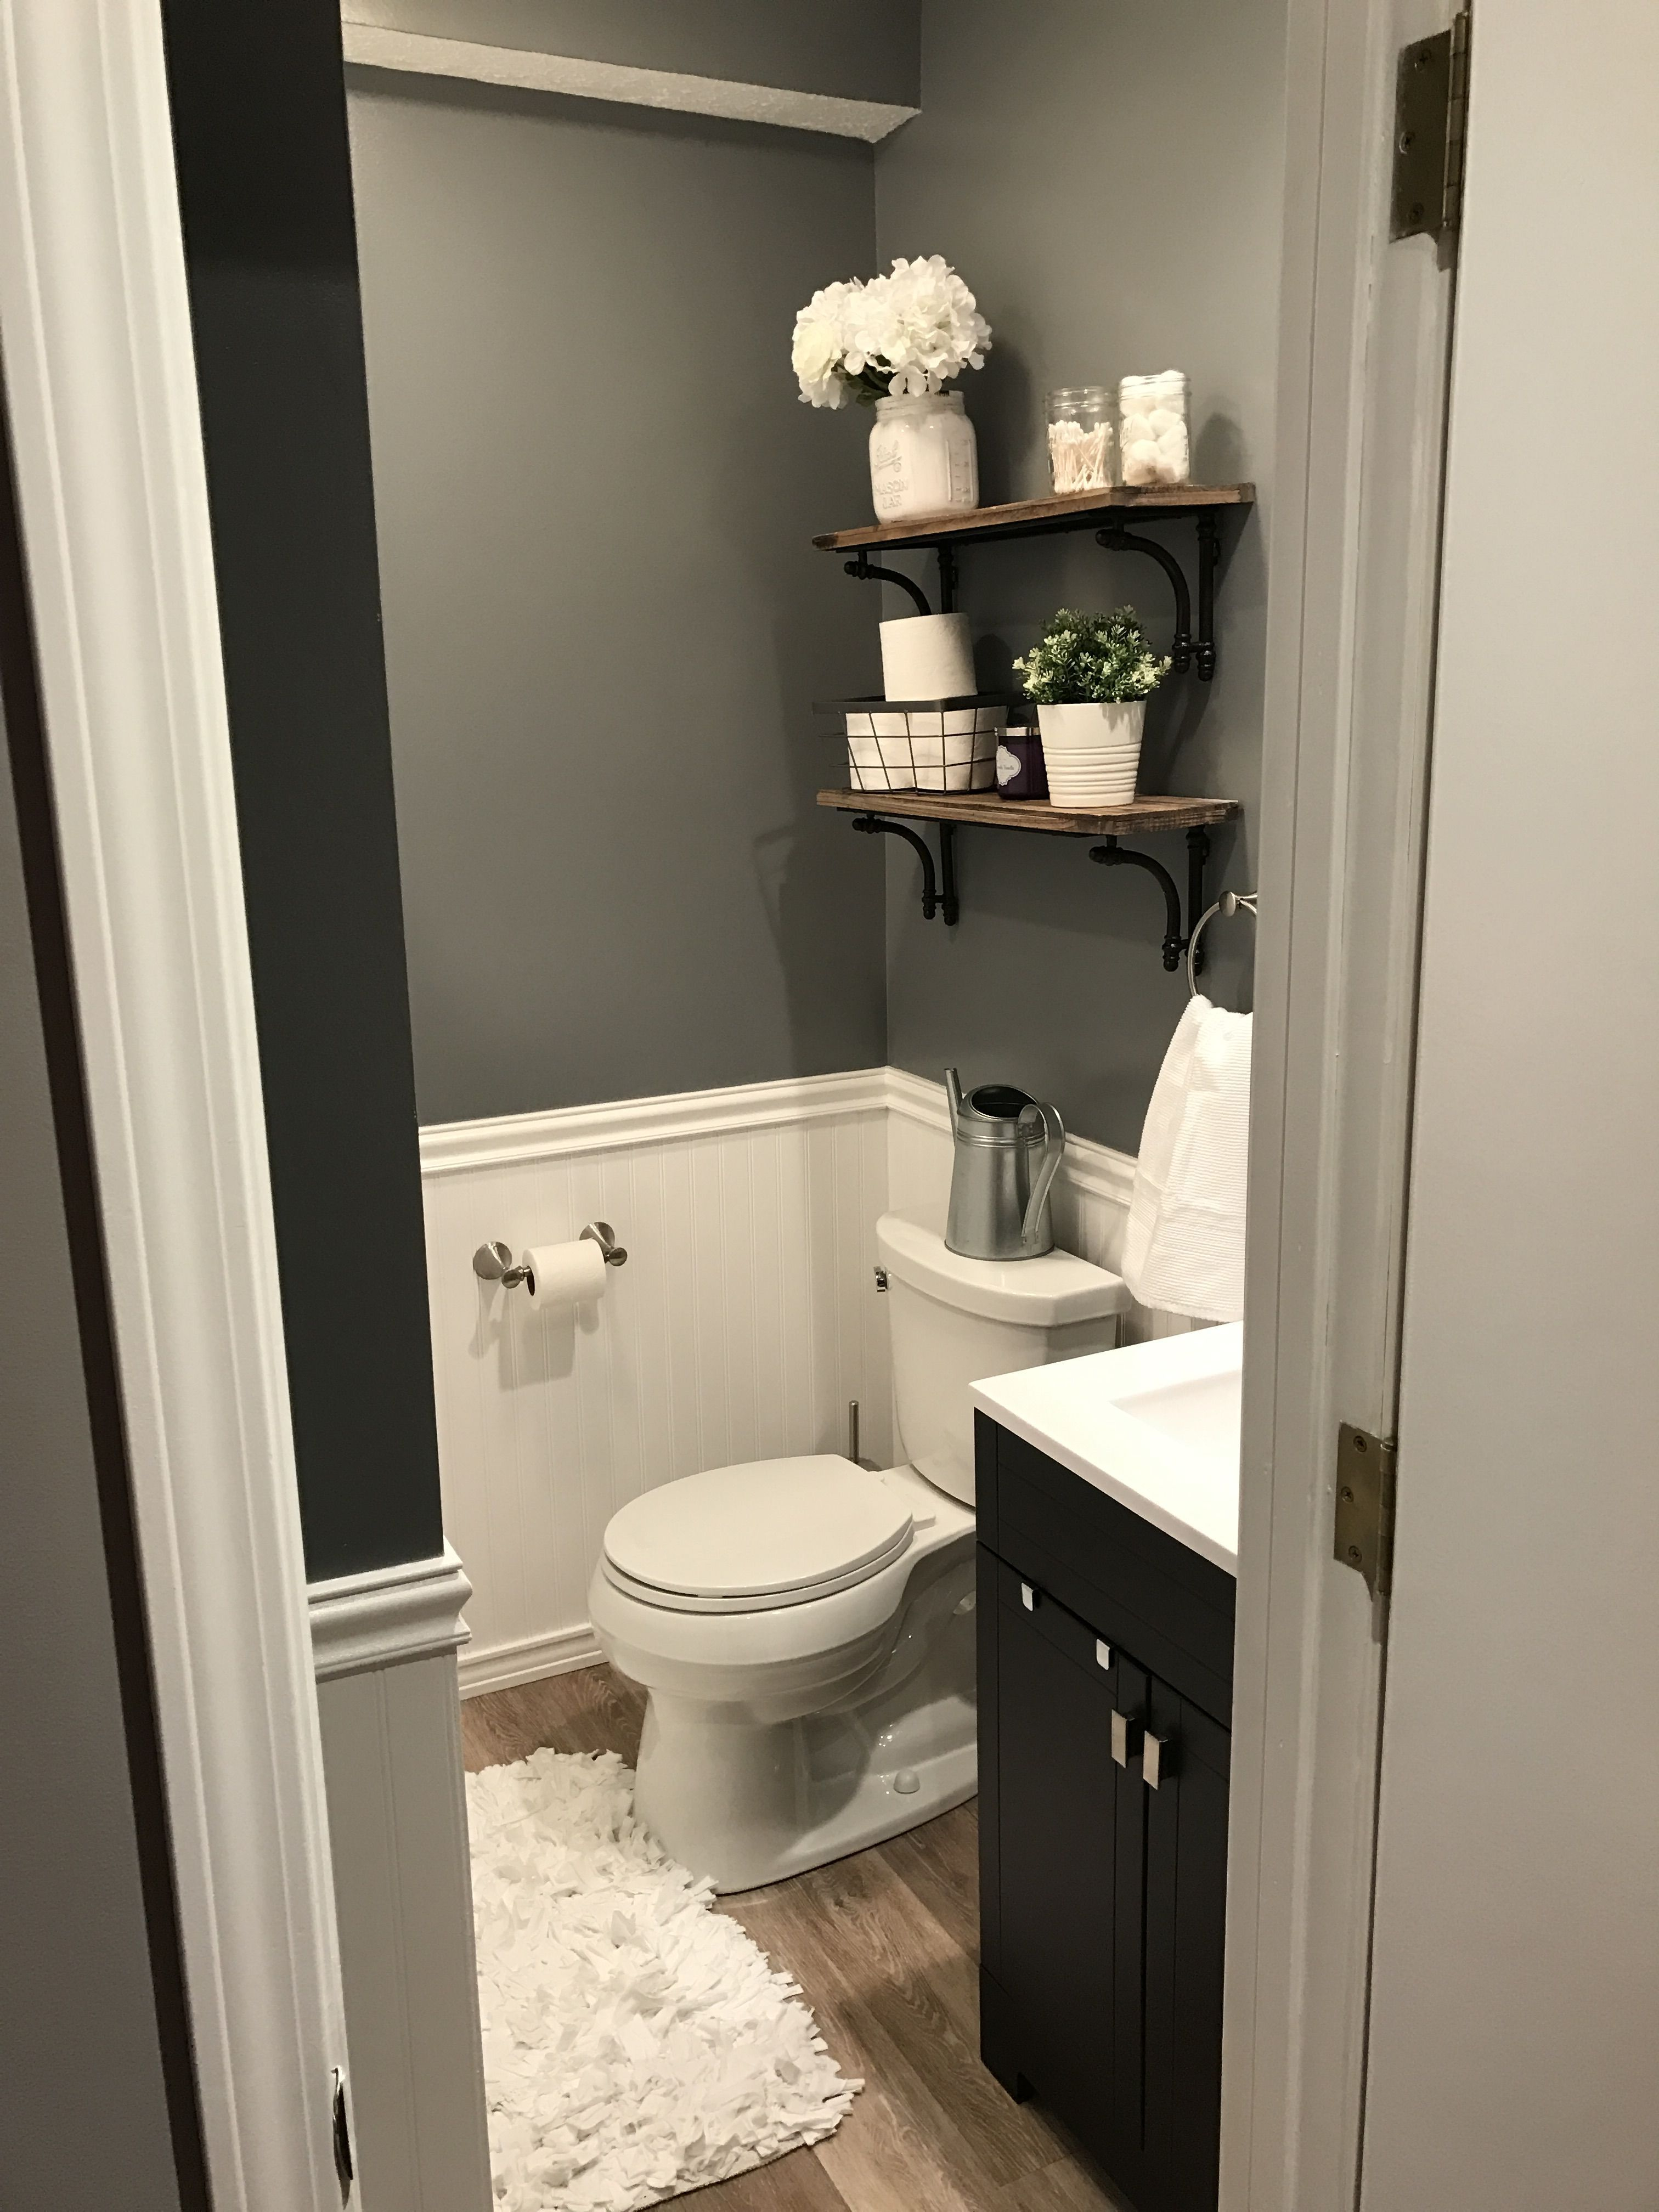 33 Trendy Basement Bathroom Ideas: 10 Trendy Basement Bathroom Ideas For Little Room (With